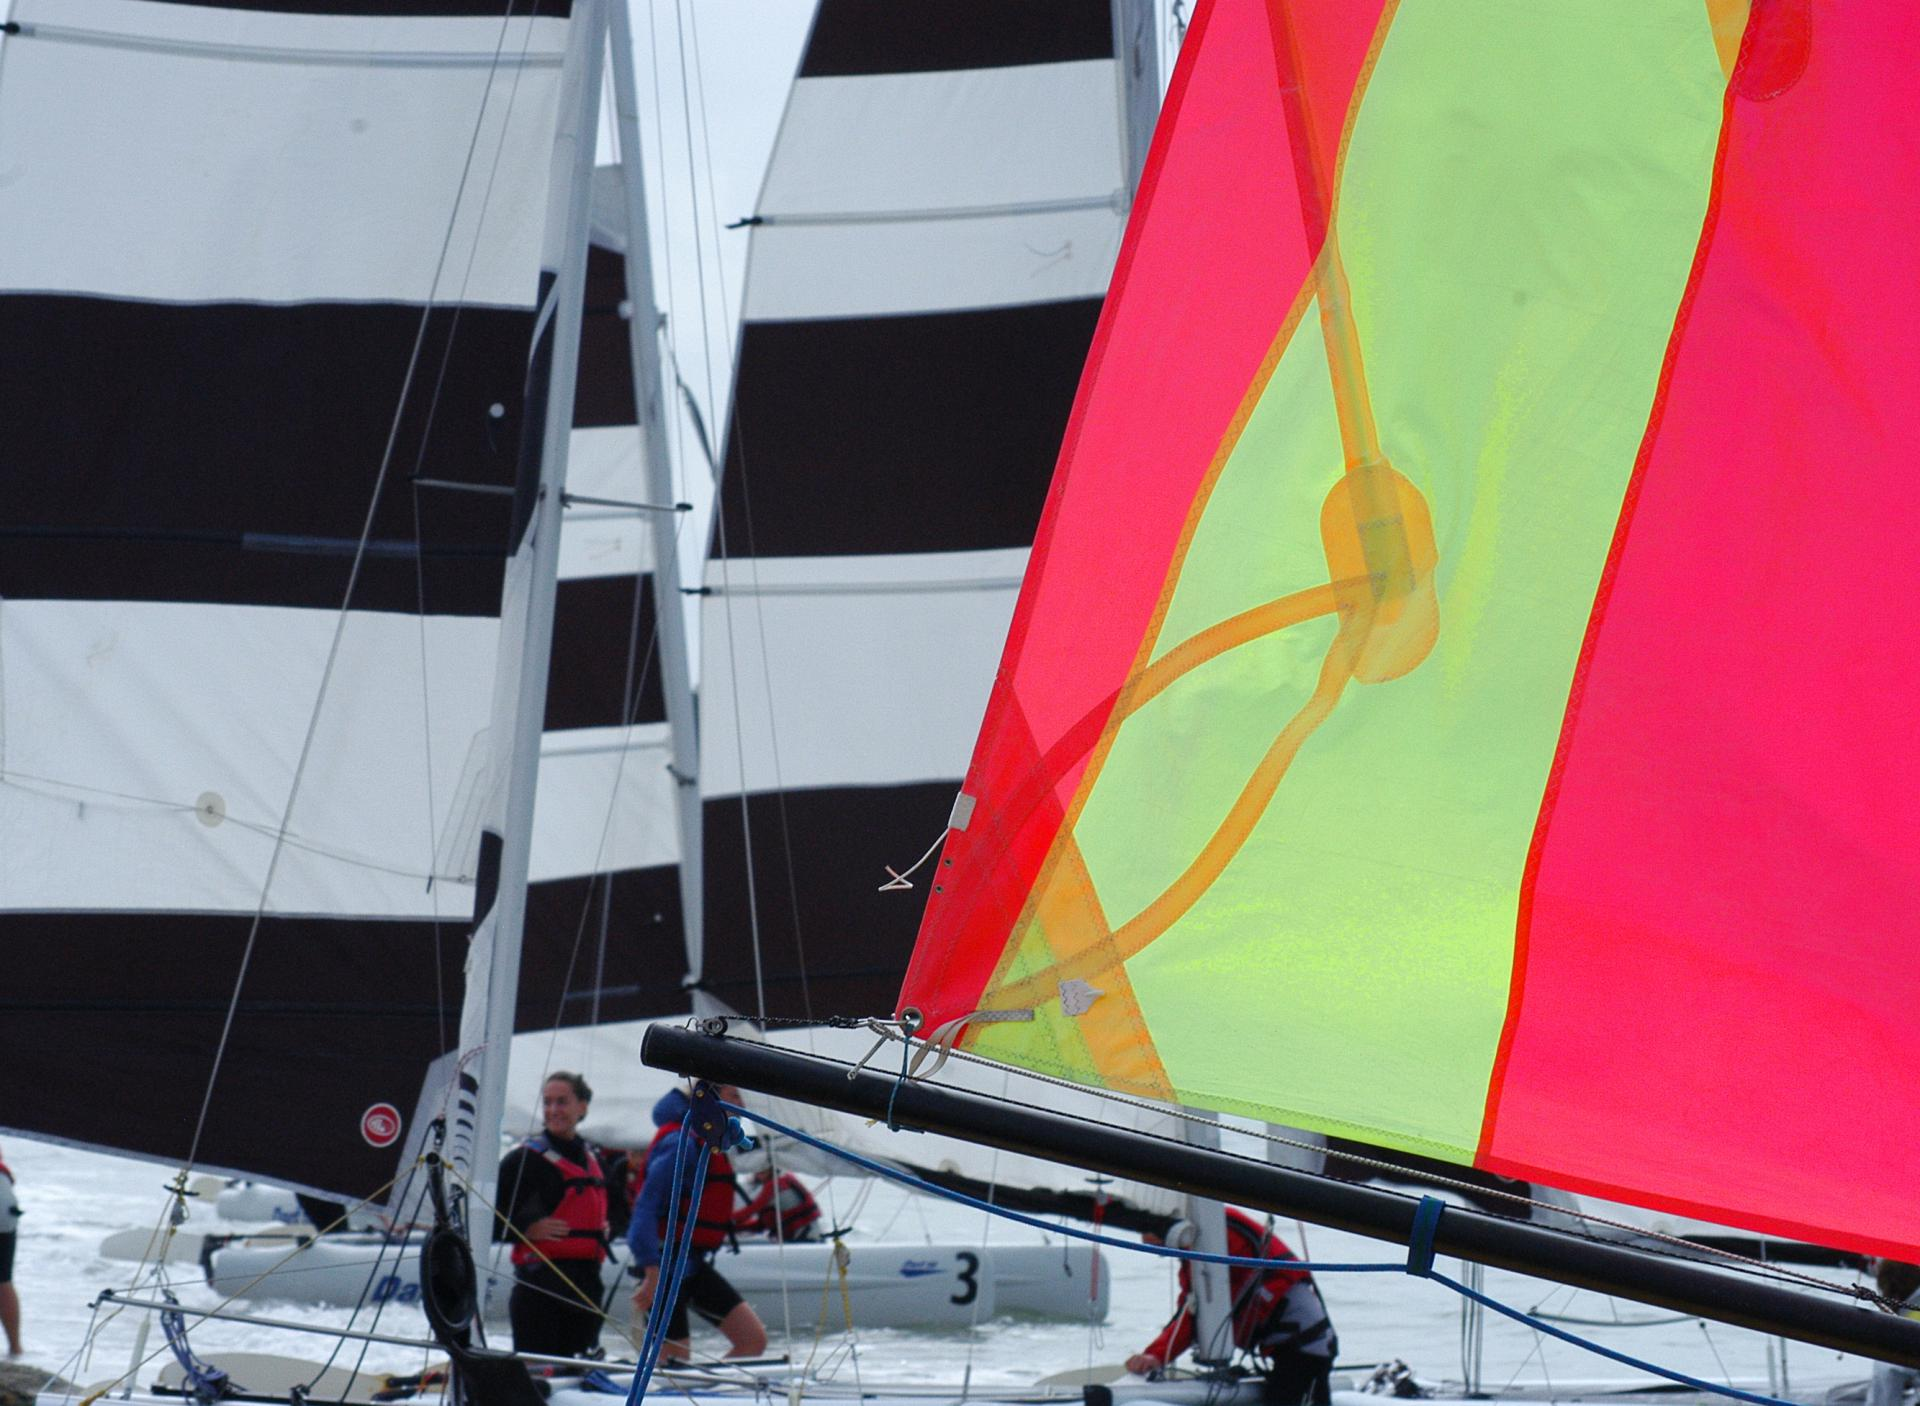 Club Nautique du Rohu - sails